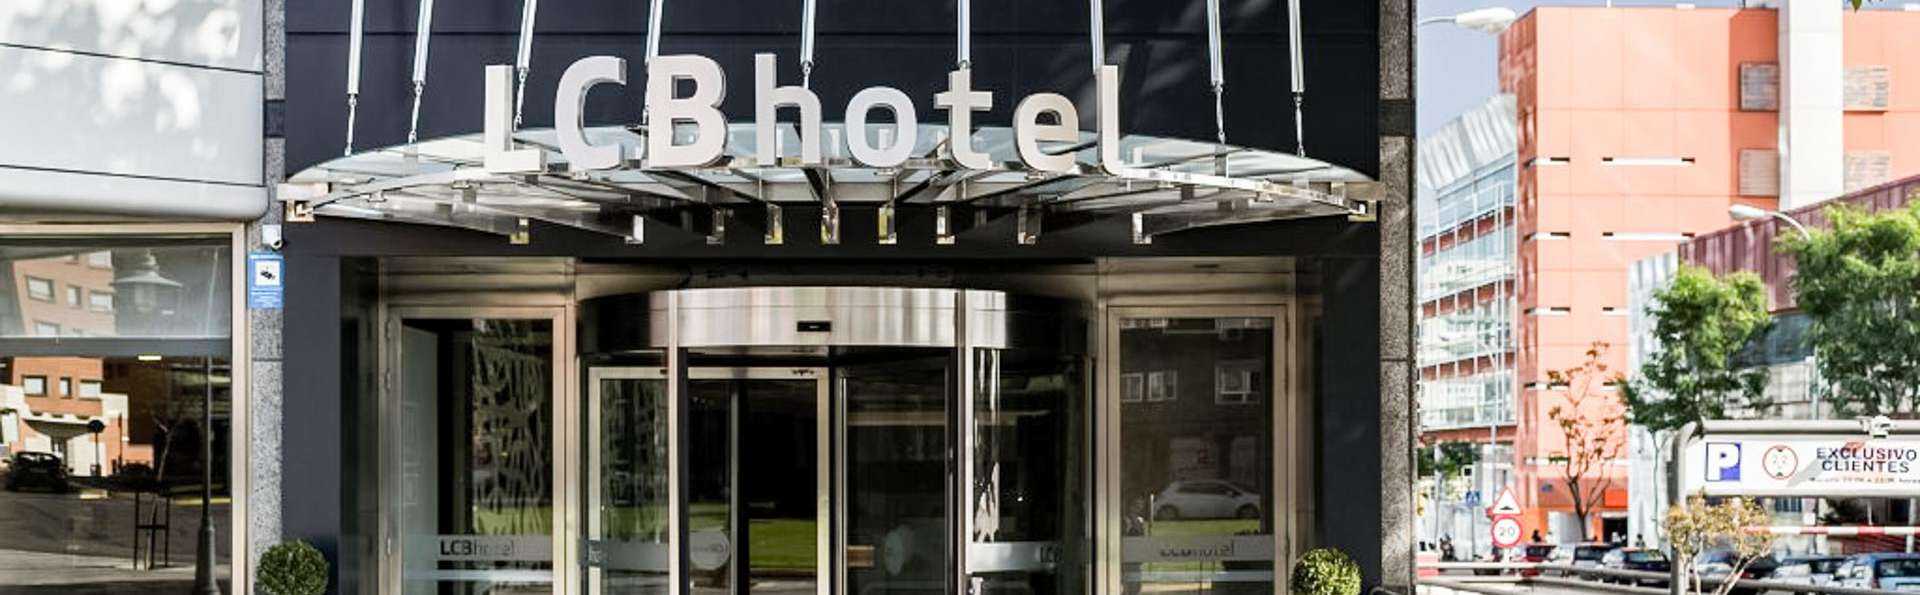 Hotel LCB Fuenlabrada - EDIT_FRONT_01.jpg